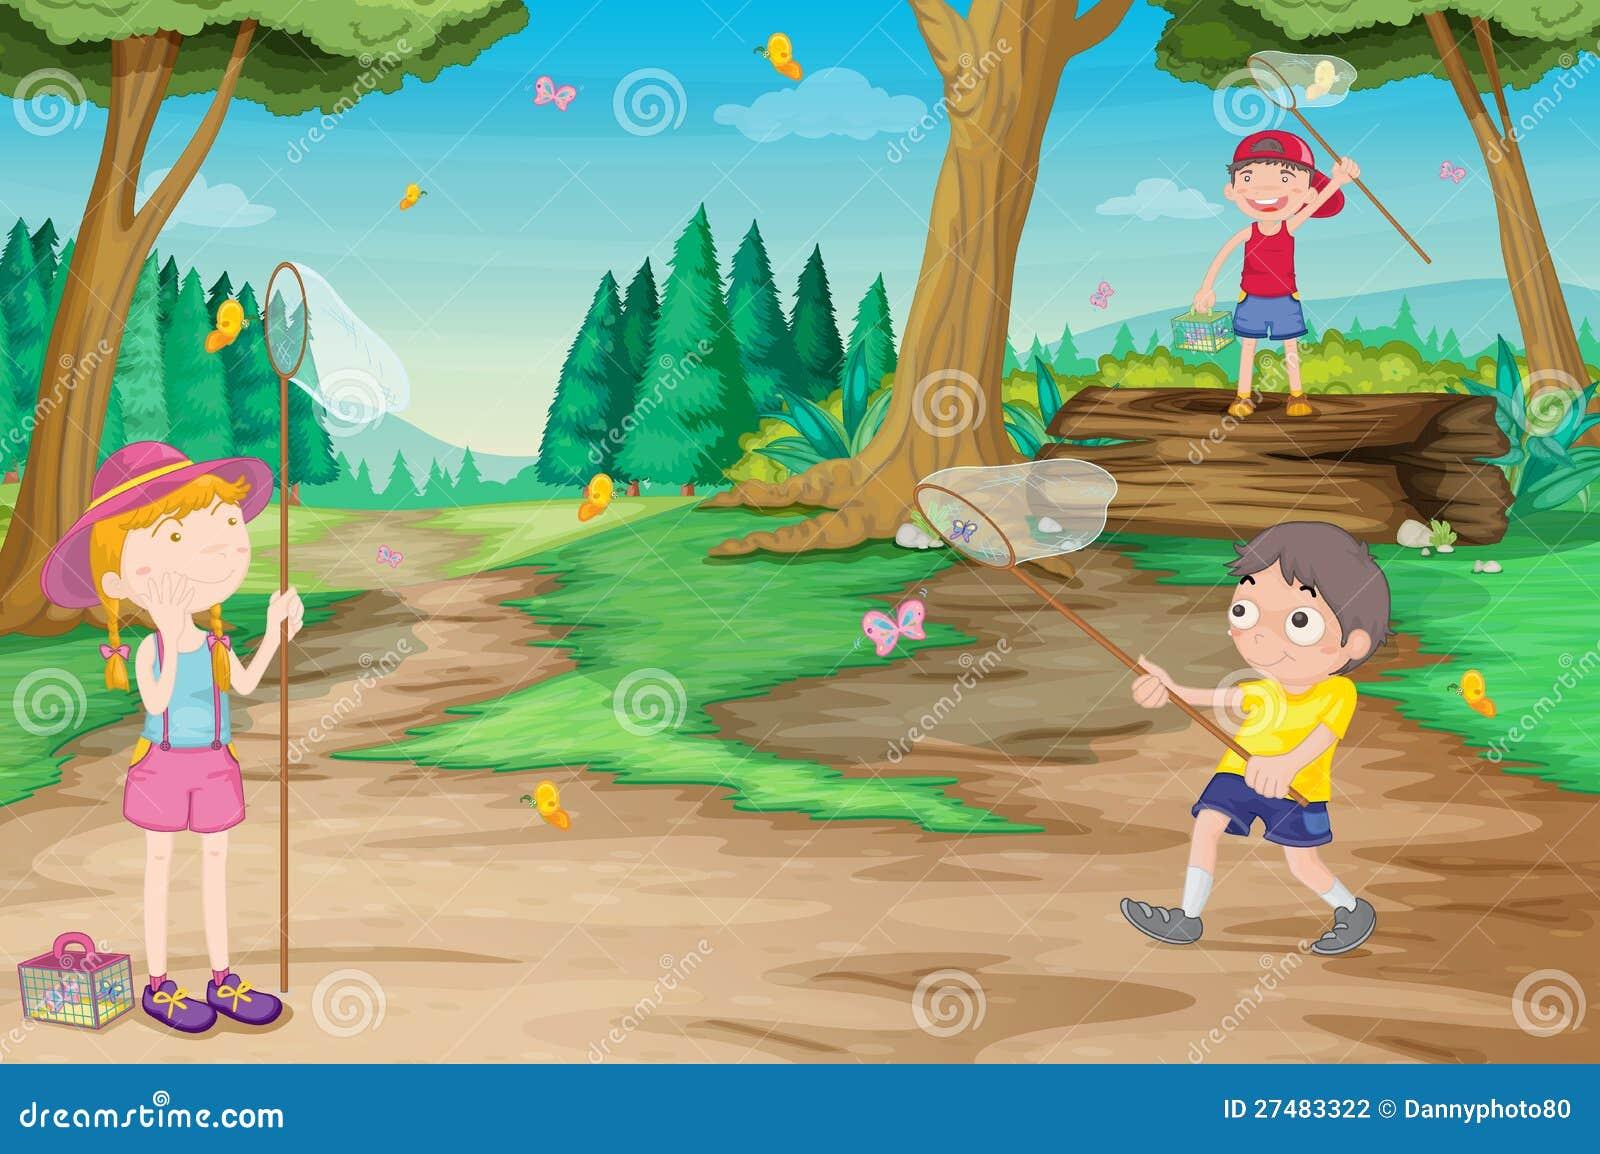 Kids in nature